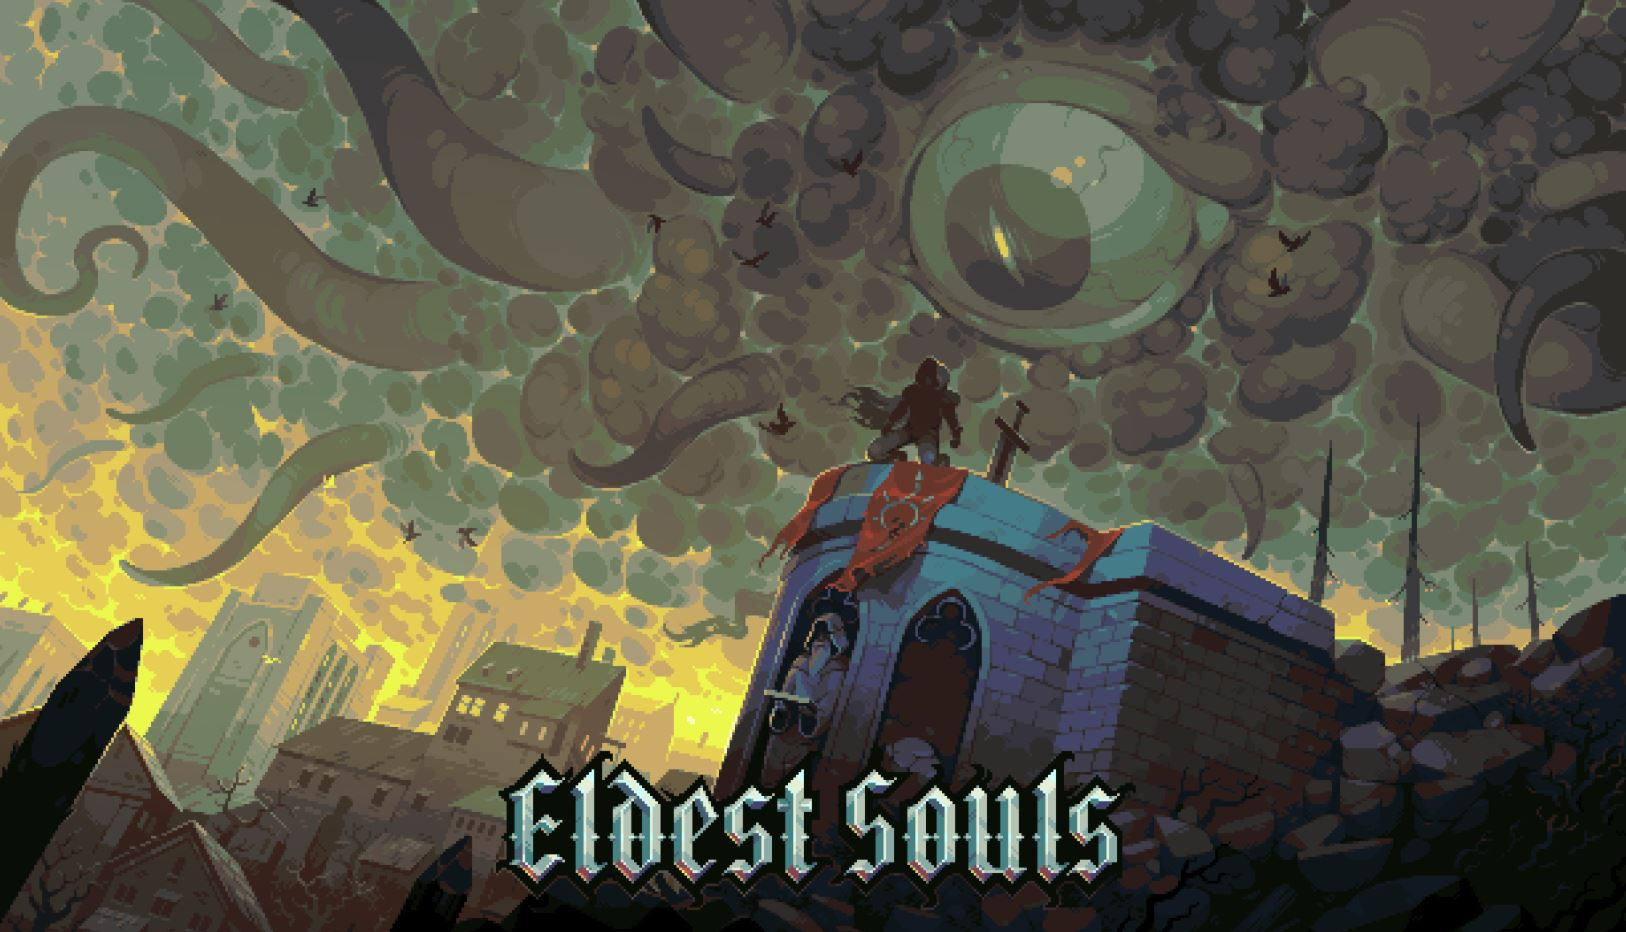 eldest-souls-ps5-ps4-news-reviews-videos